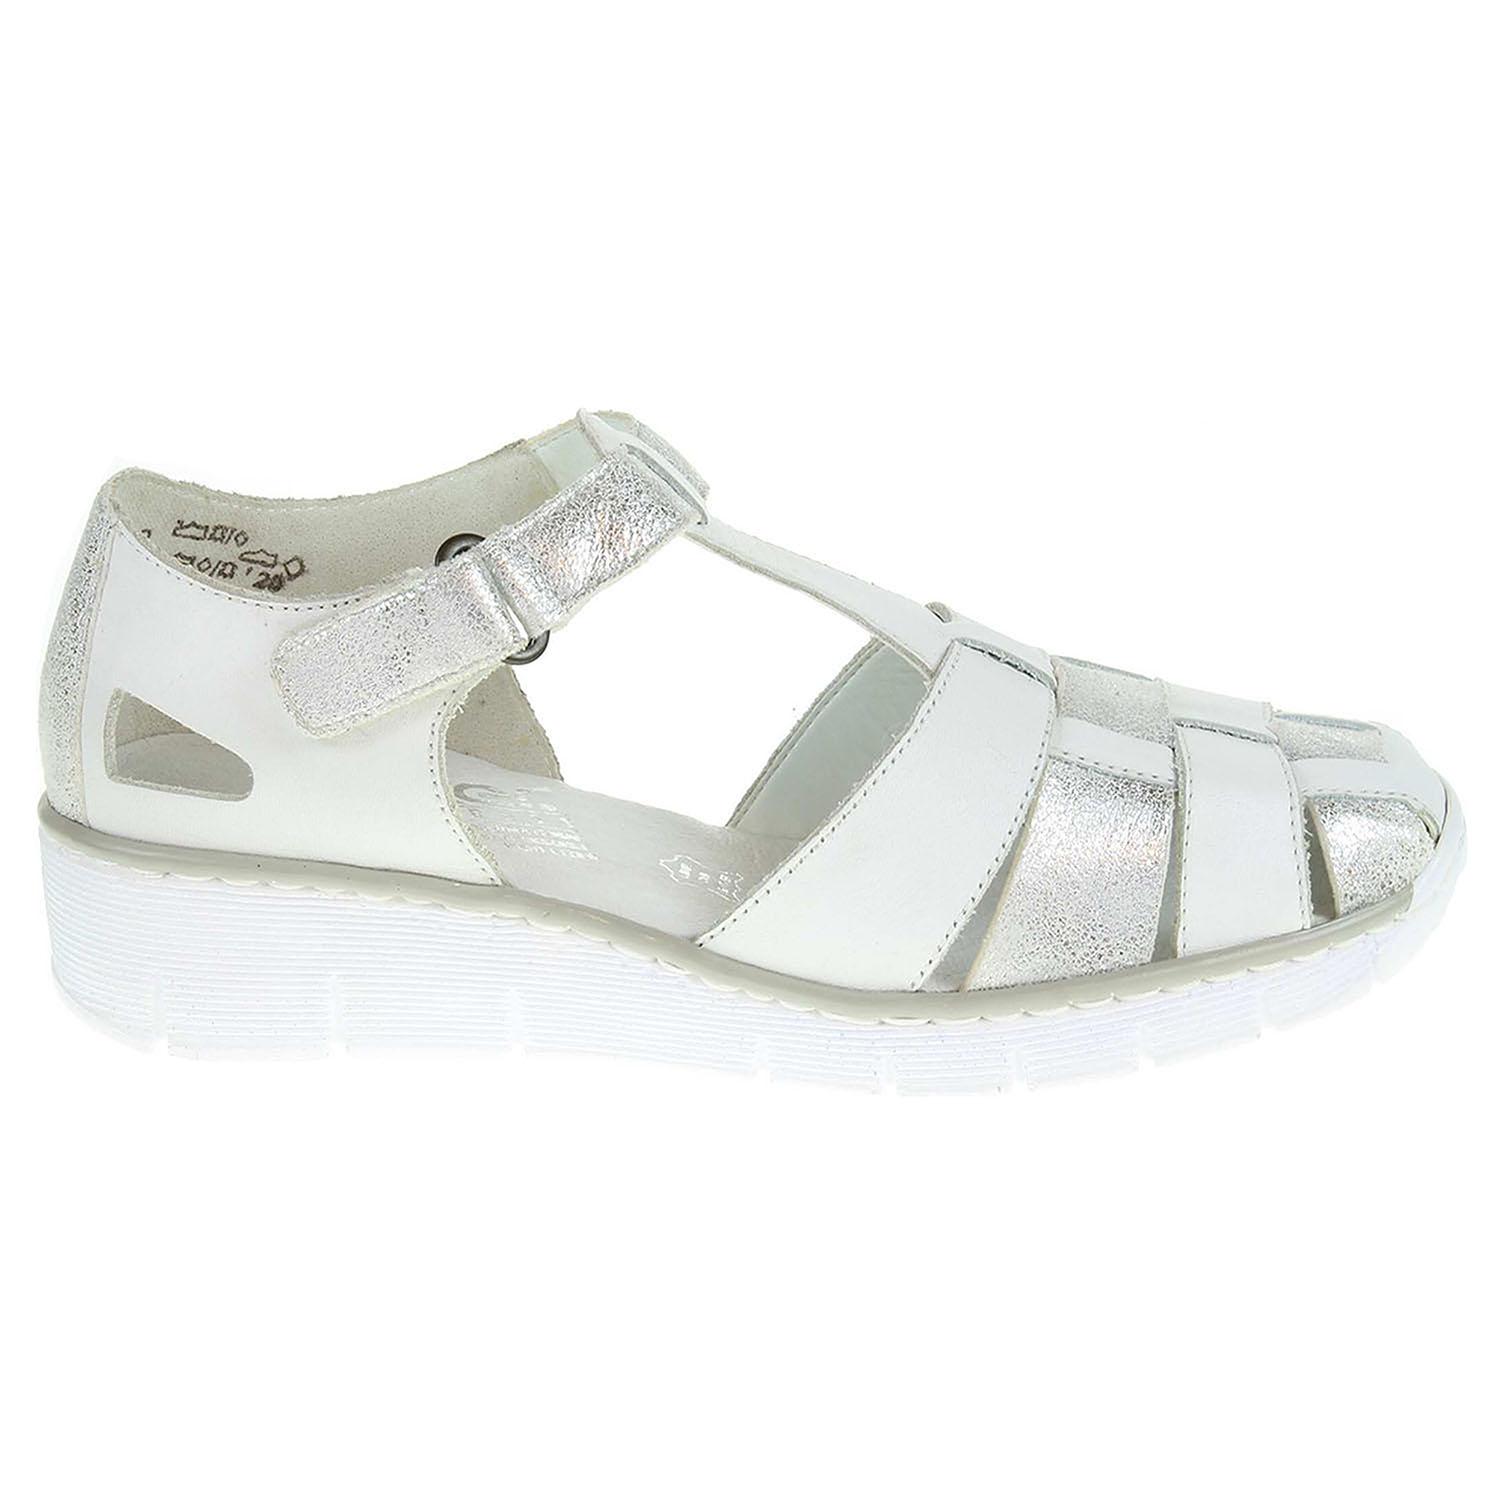 Ecco Rieker dámské sandály 53769-80 bílá-stříbrná 23801161